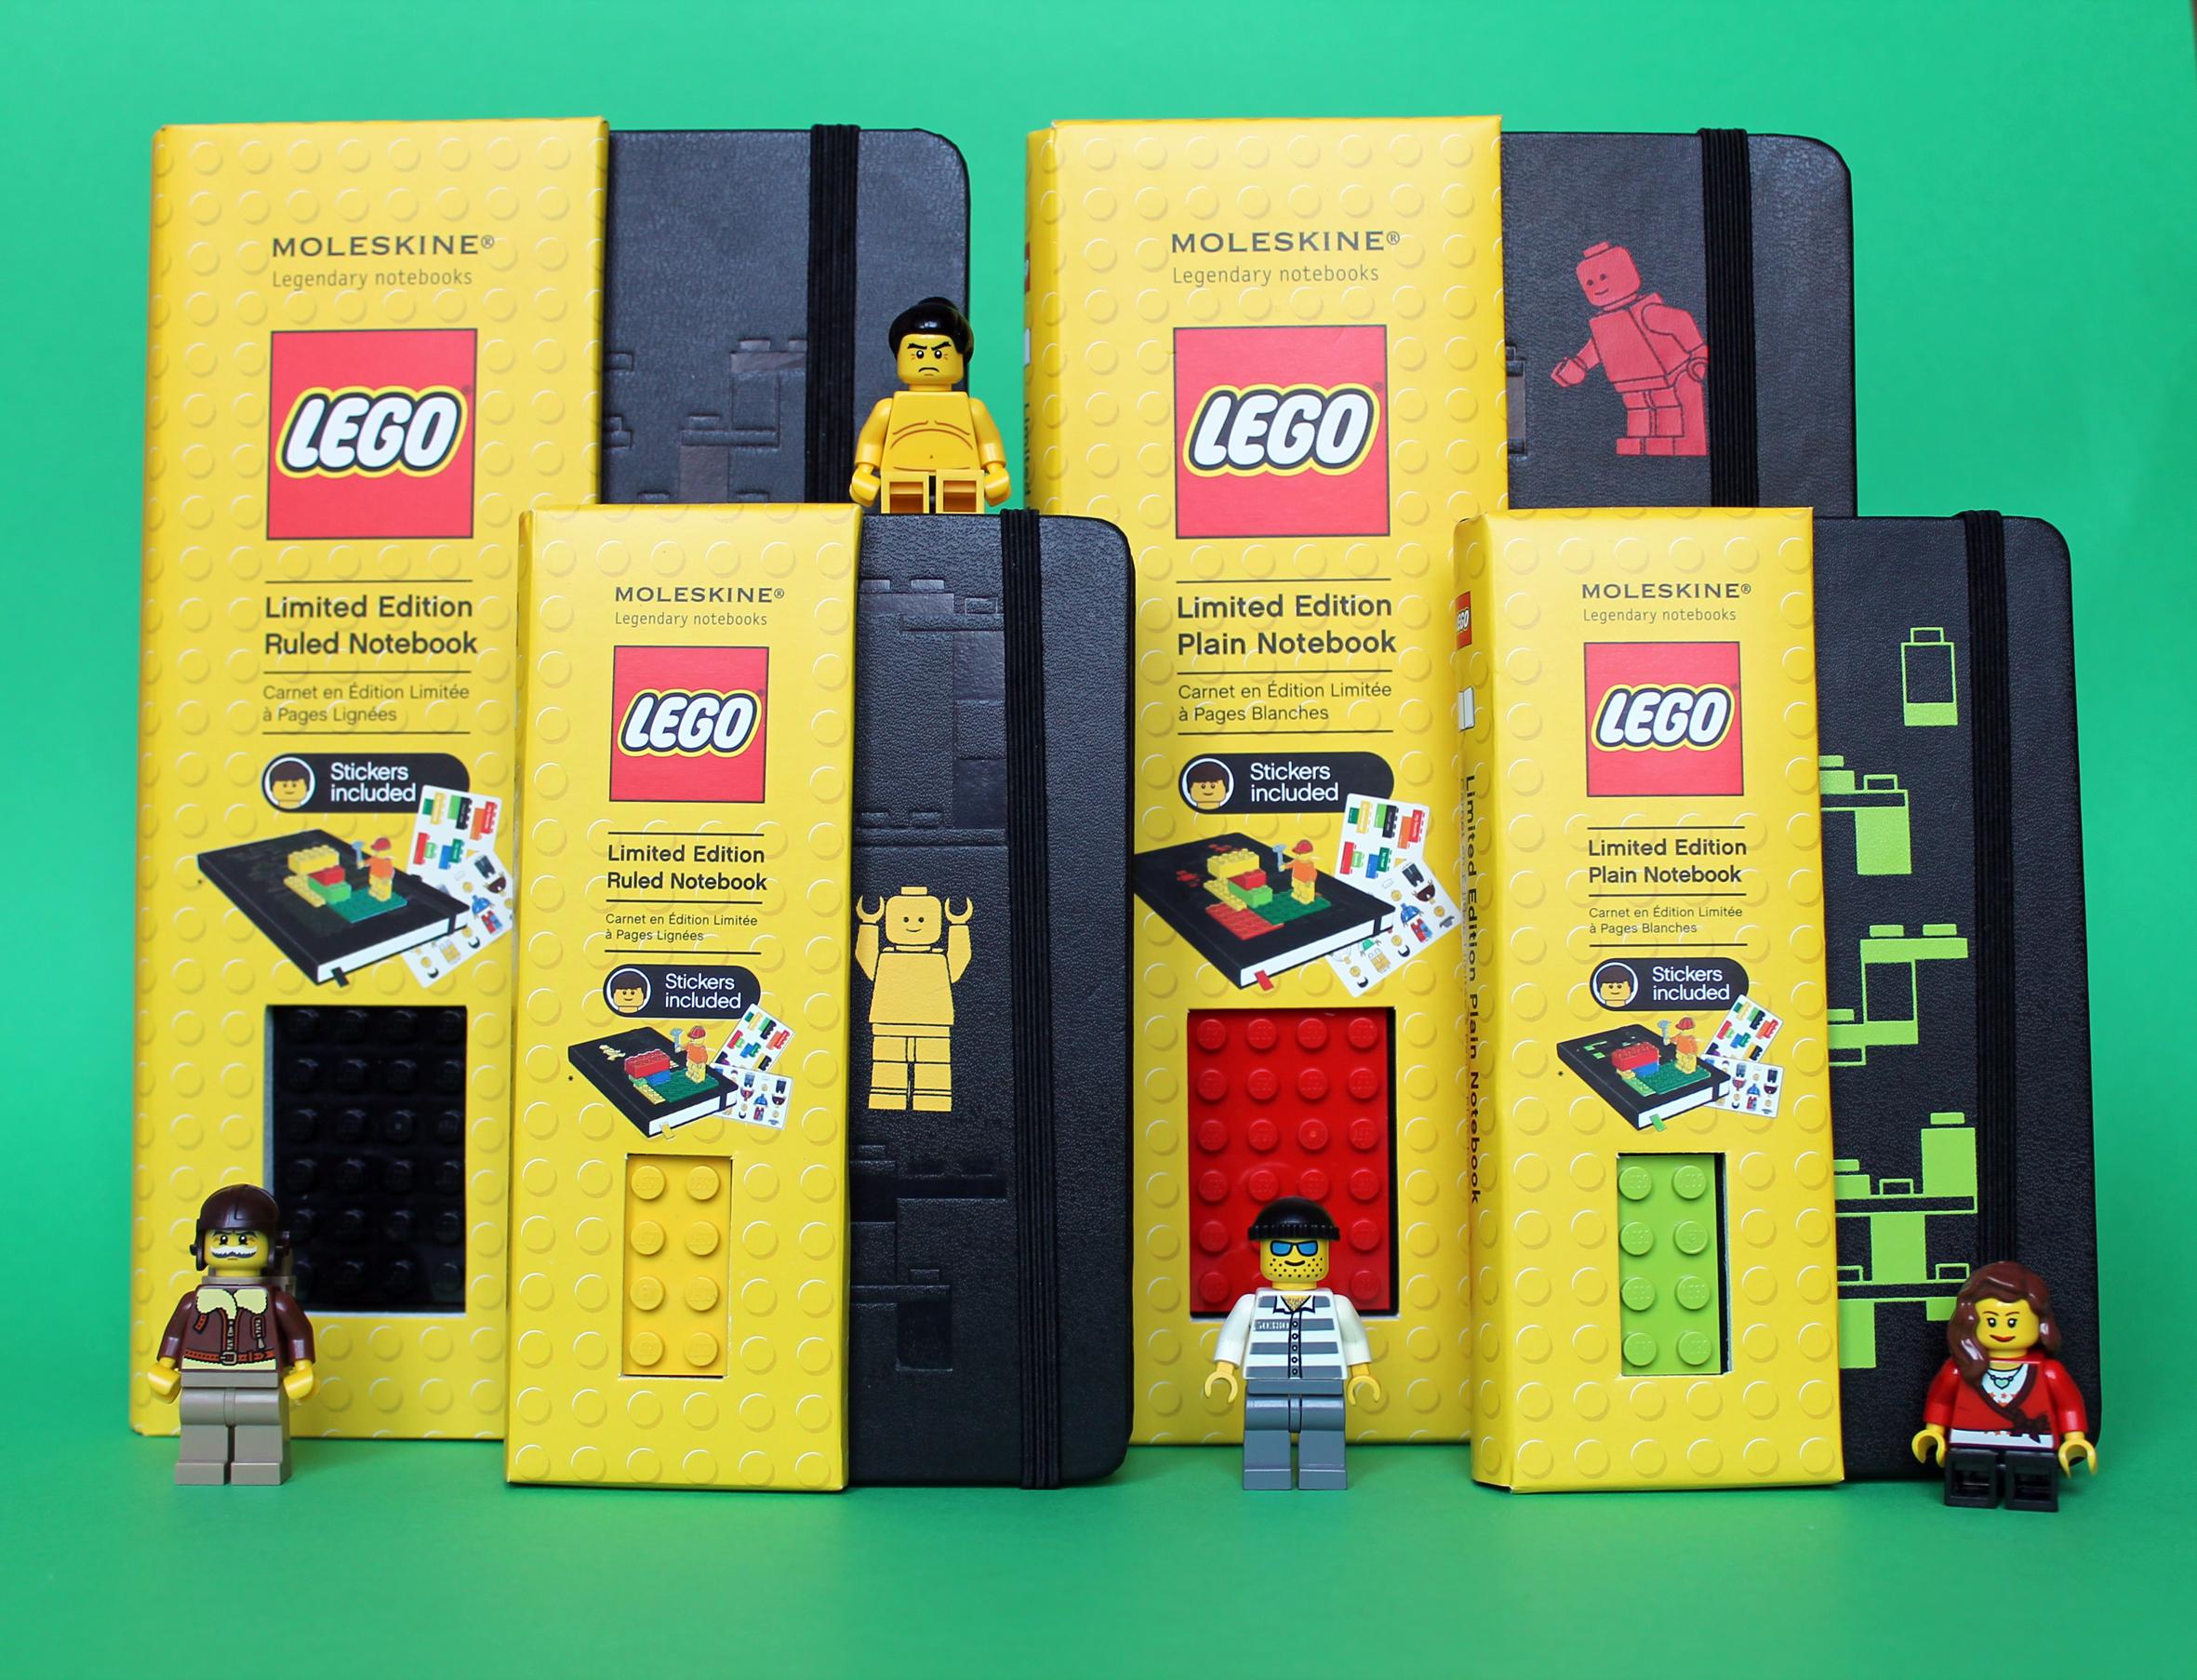 Legondär – Moleskine meets LEGO